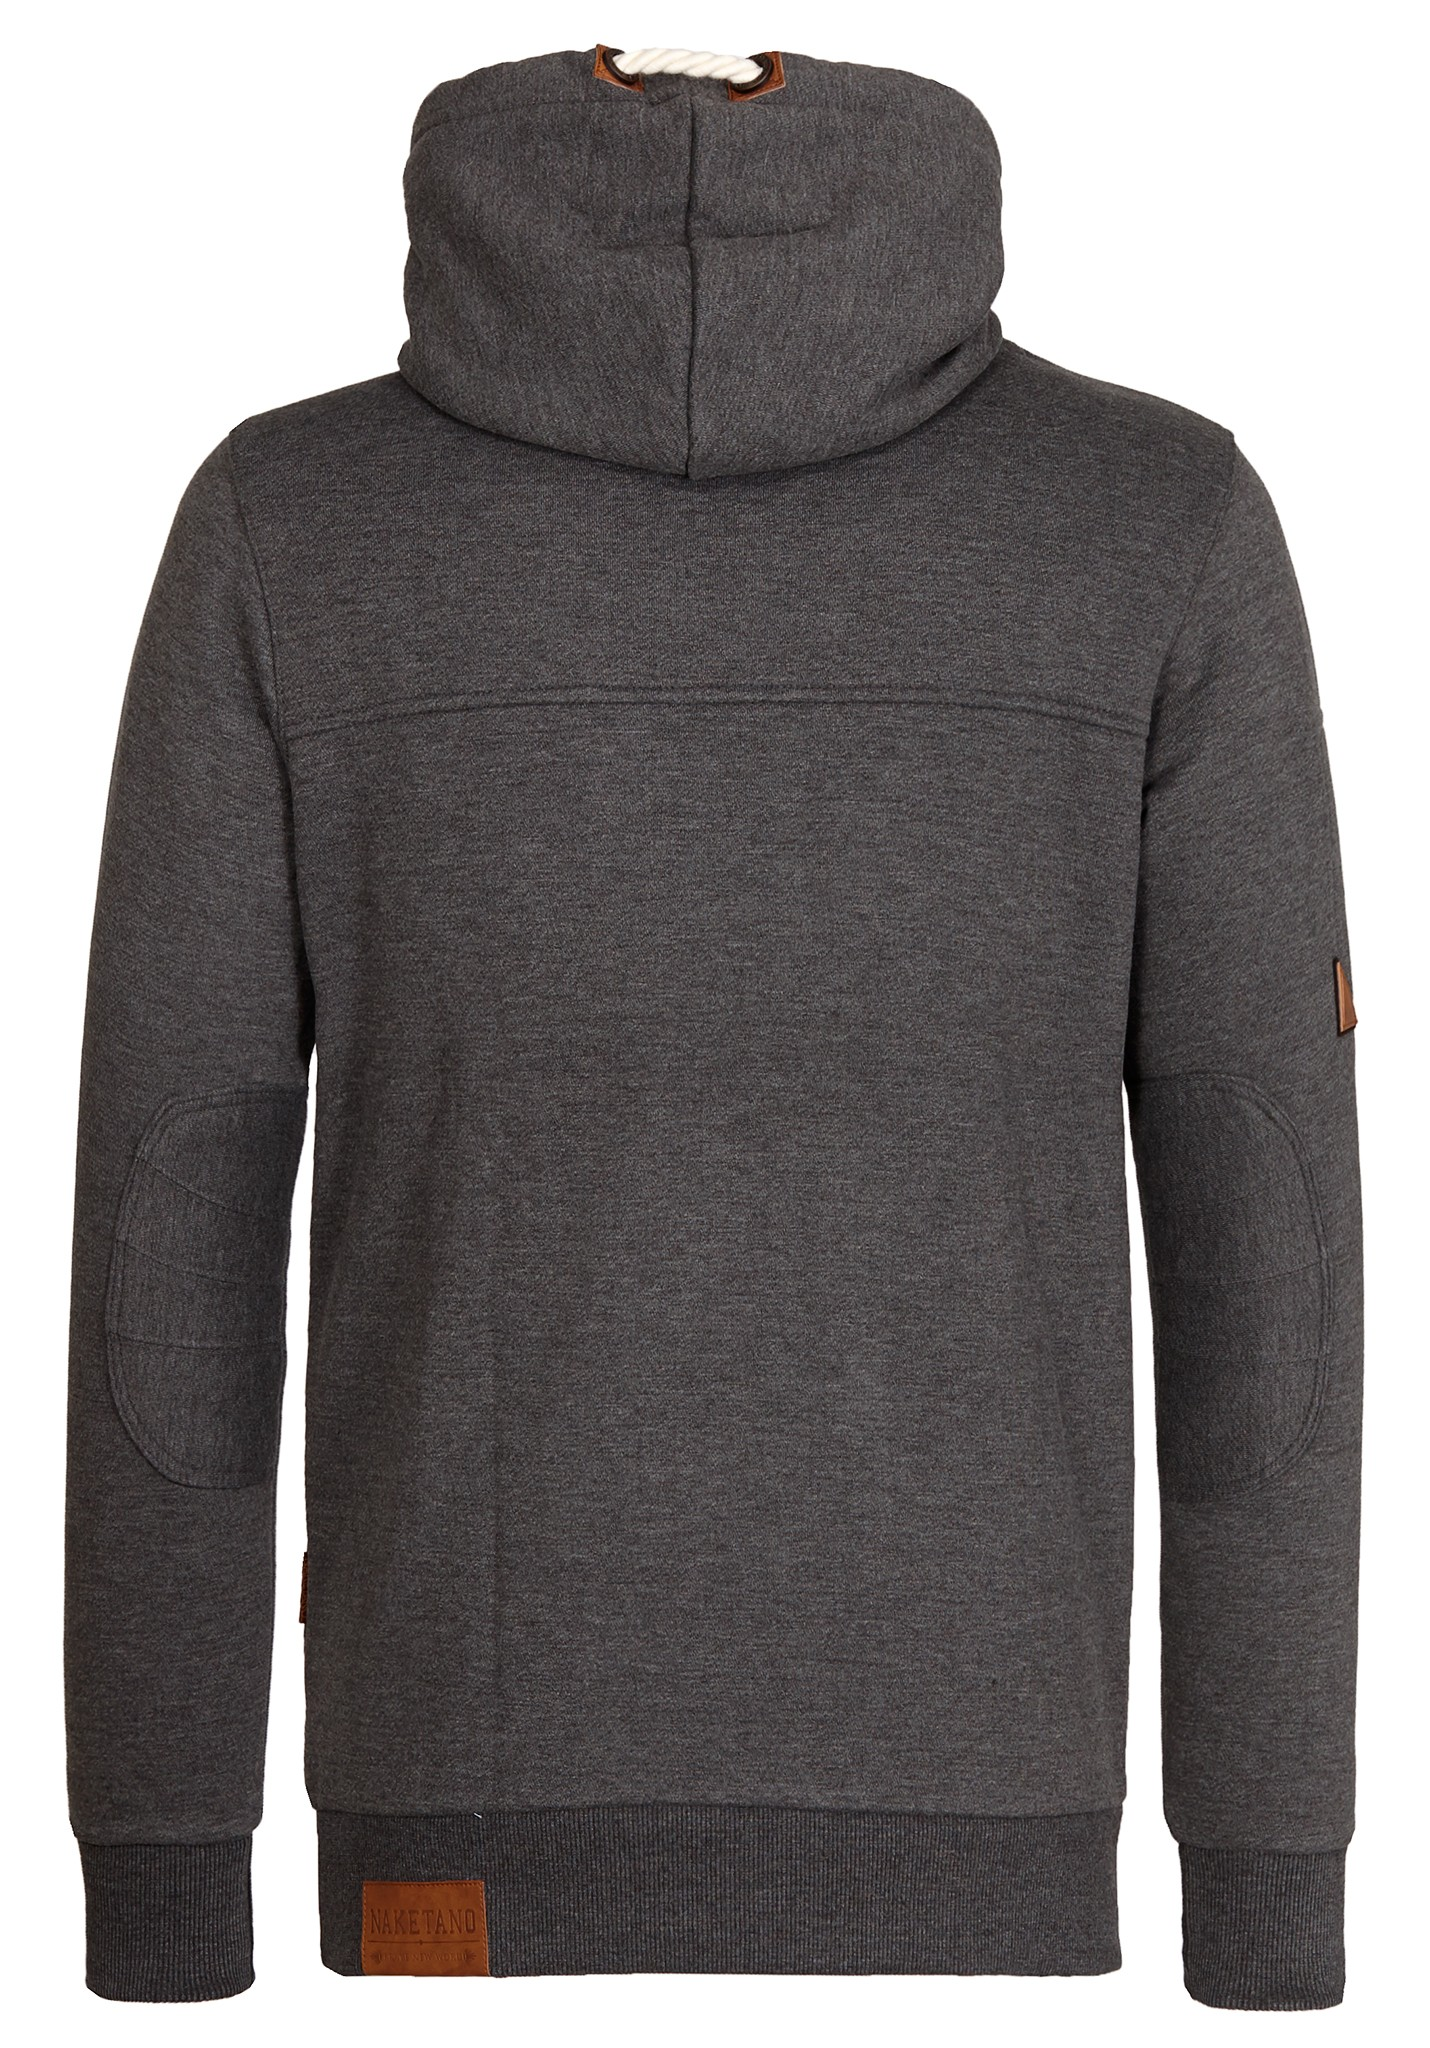 neu naketano pimp vi herren kapuzenpullover pullover hoodie kapuzenjacke ebay. Black Bedroom Furniture Sets. Home Design Ideas